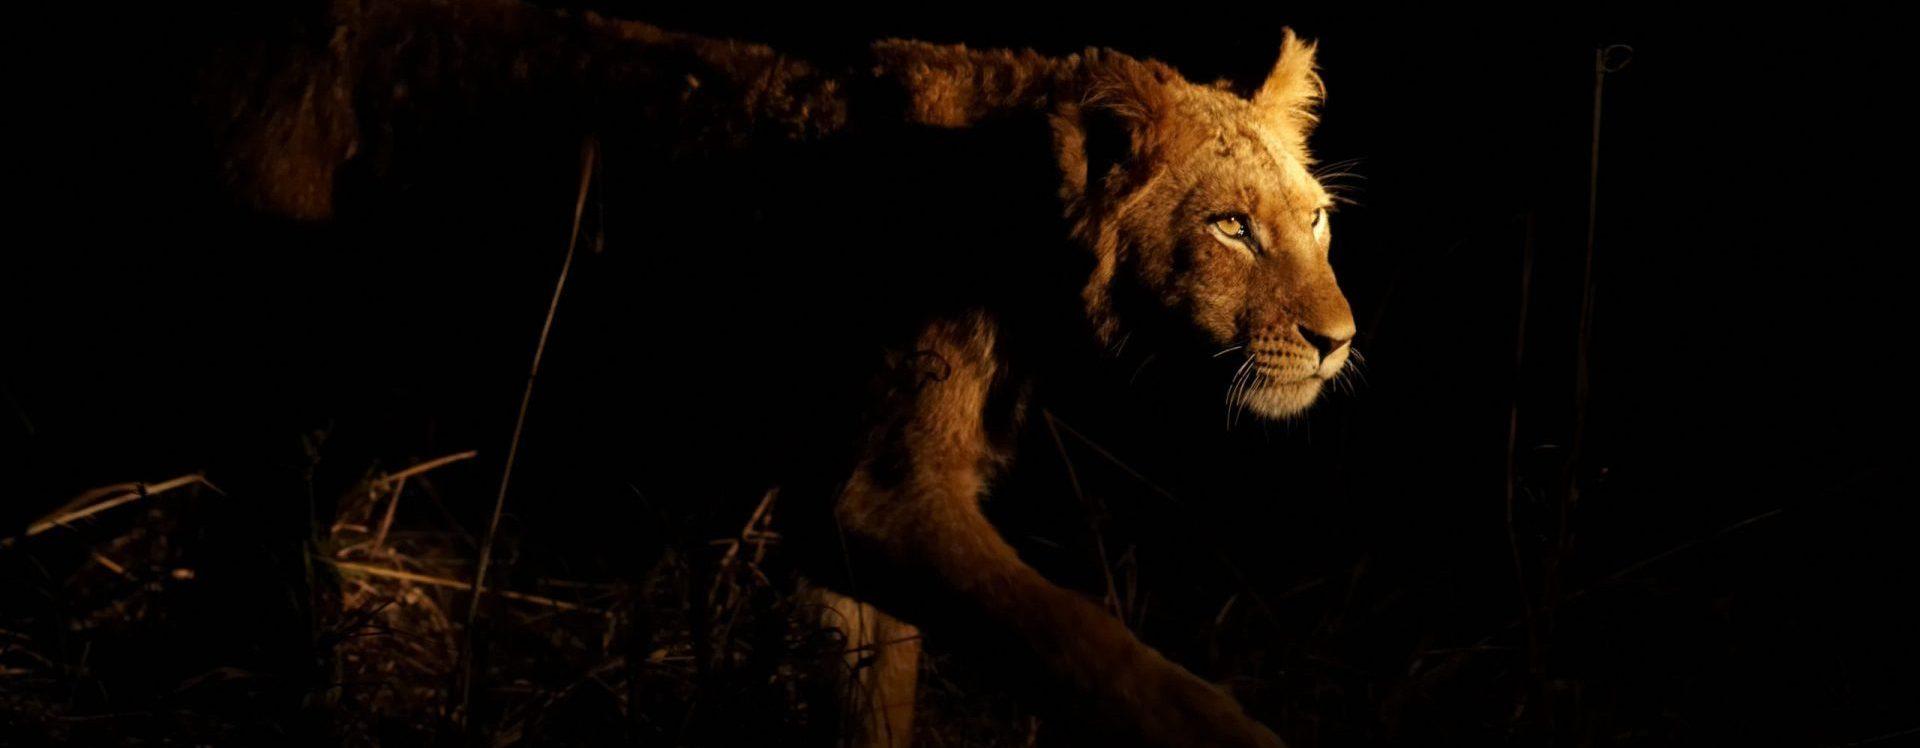 Metis Wisdom Dr Janeta Tansey Lioness Header